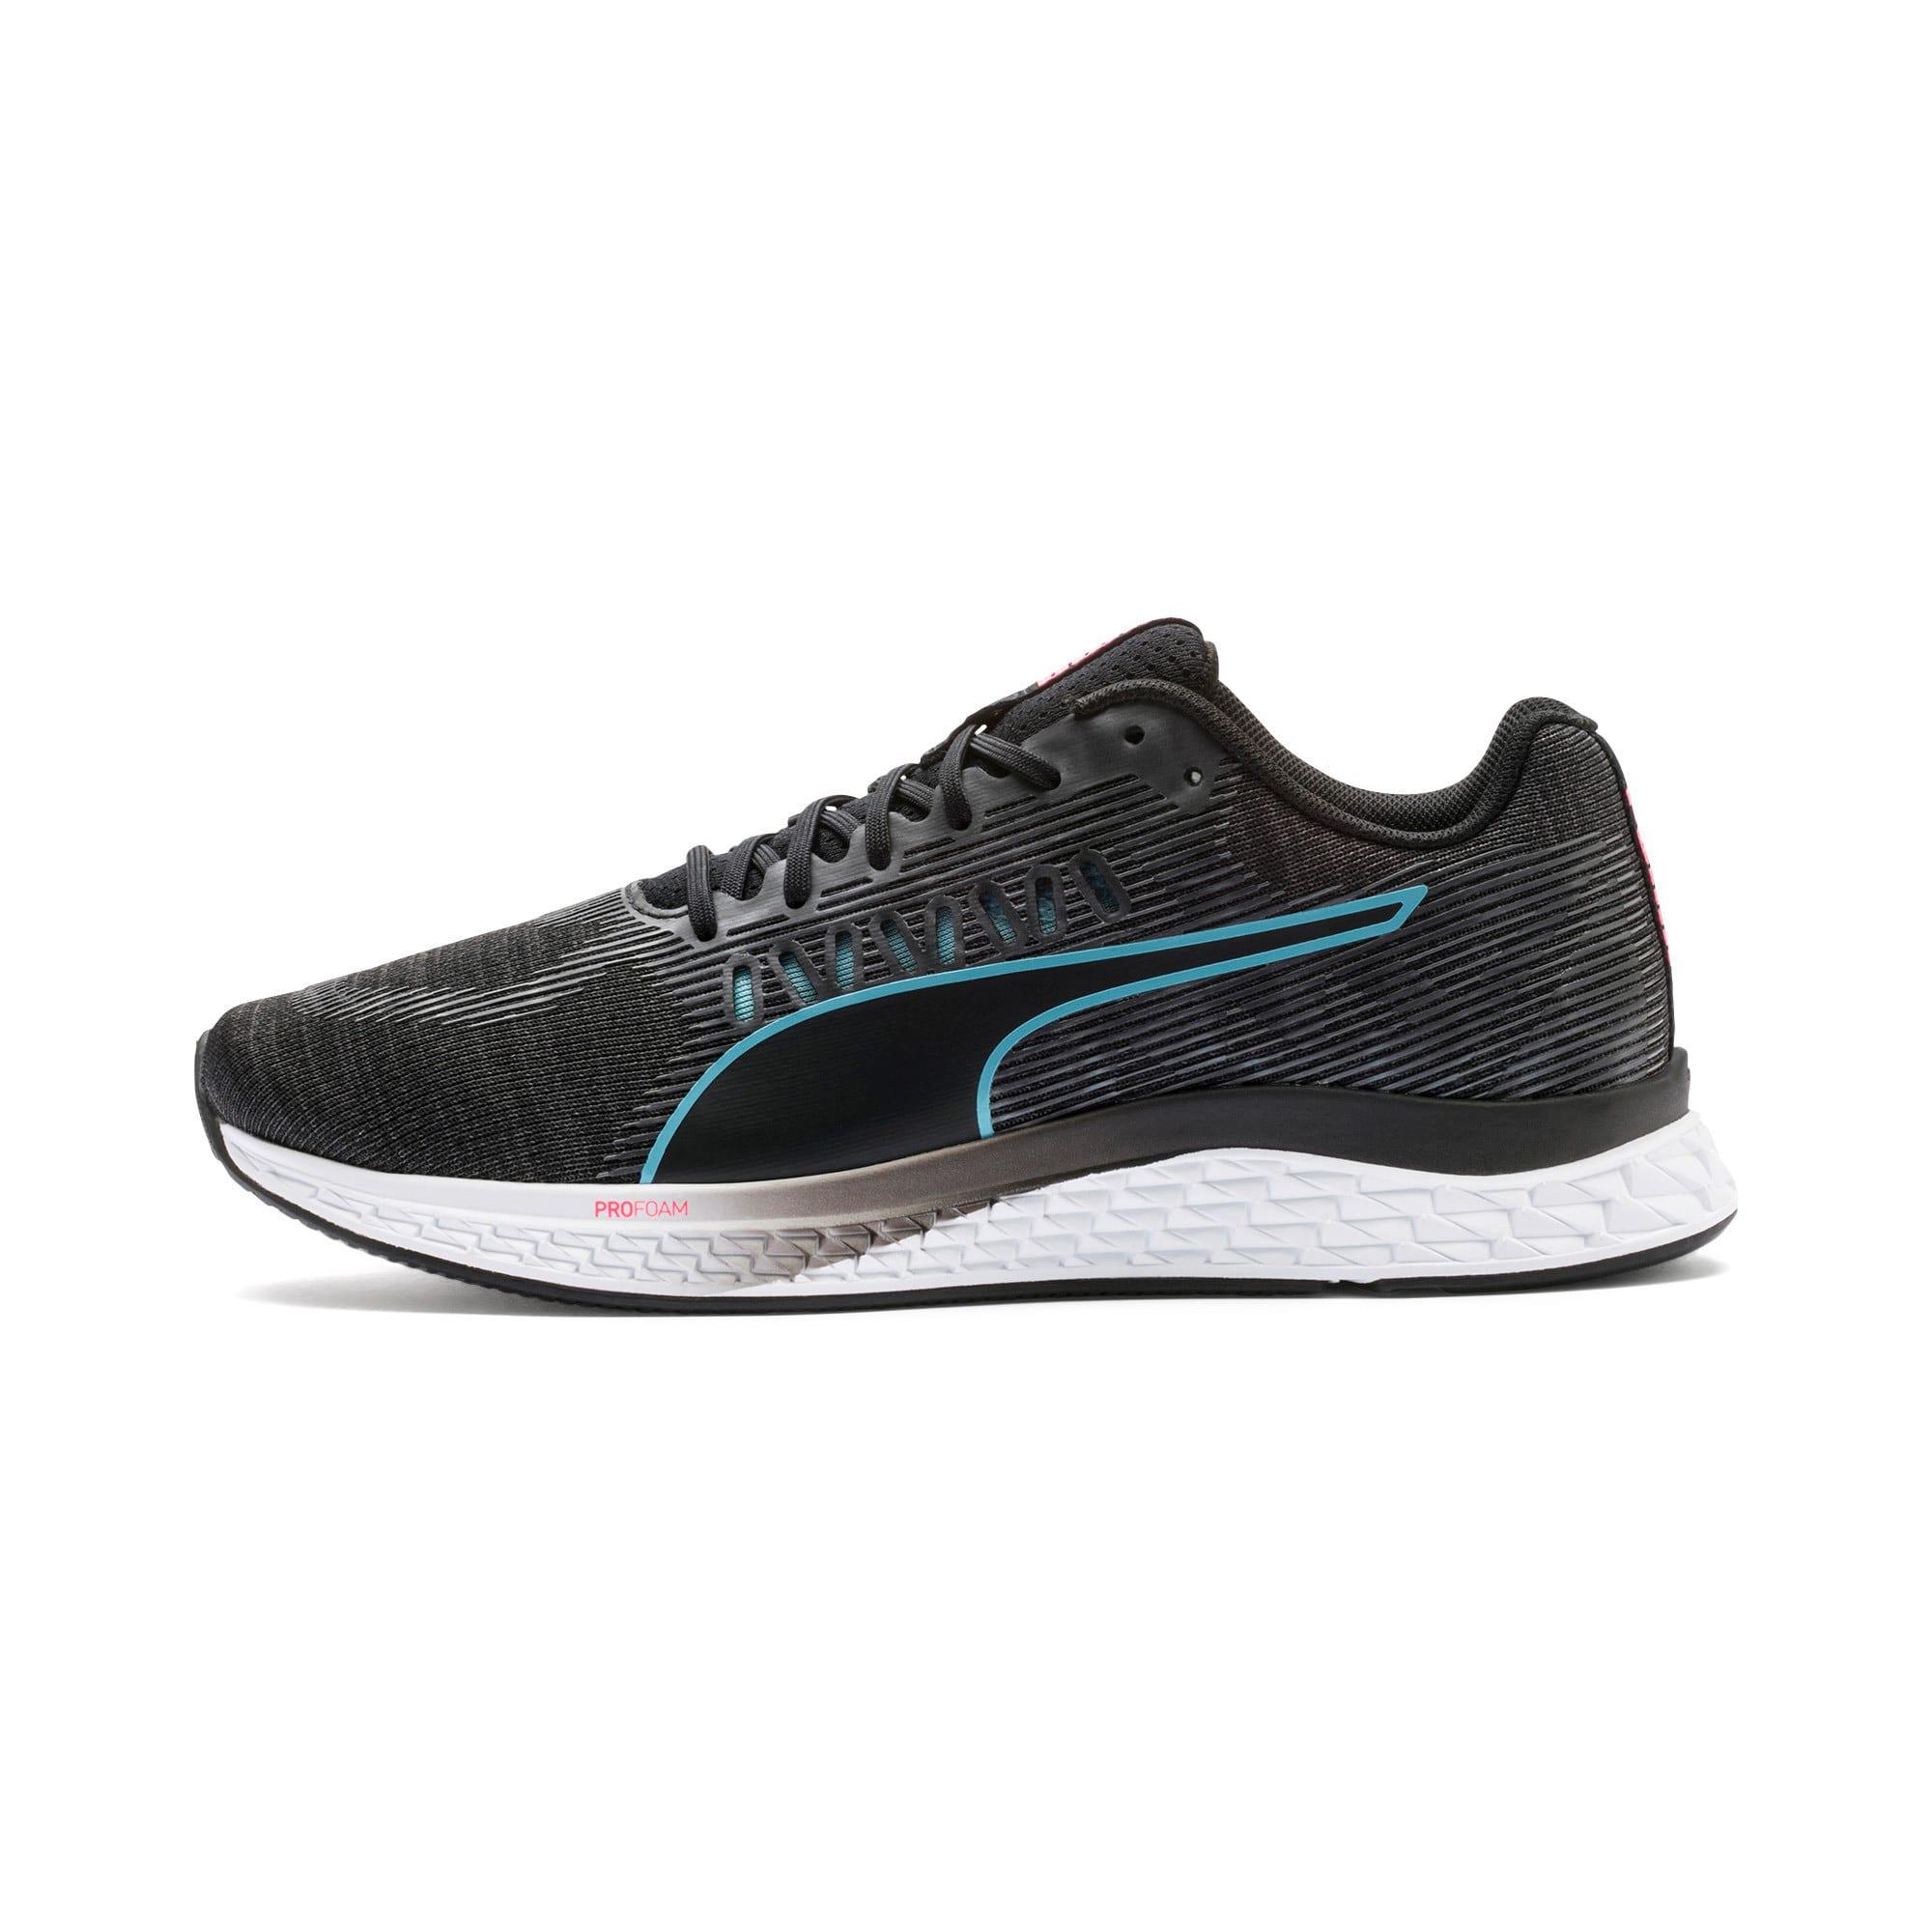 Thumbnail 1 of Speed Sutamina Women's Running Shoes, Black-Milky Blue-Pink Alert, medium